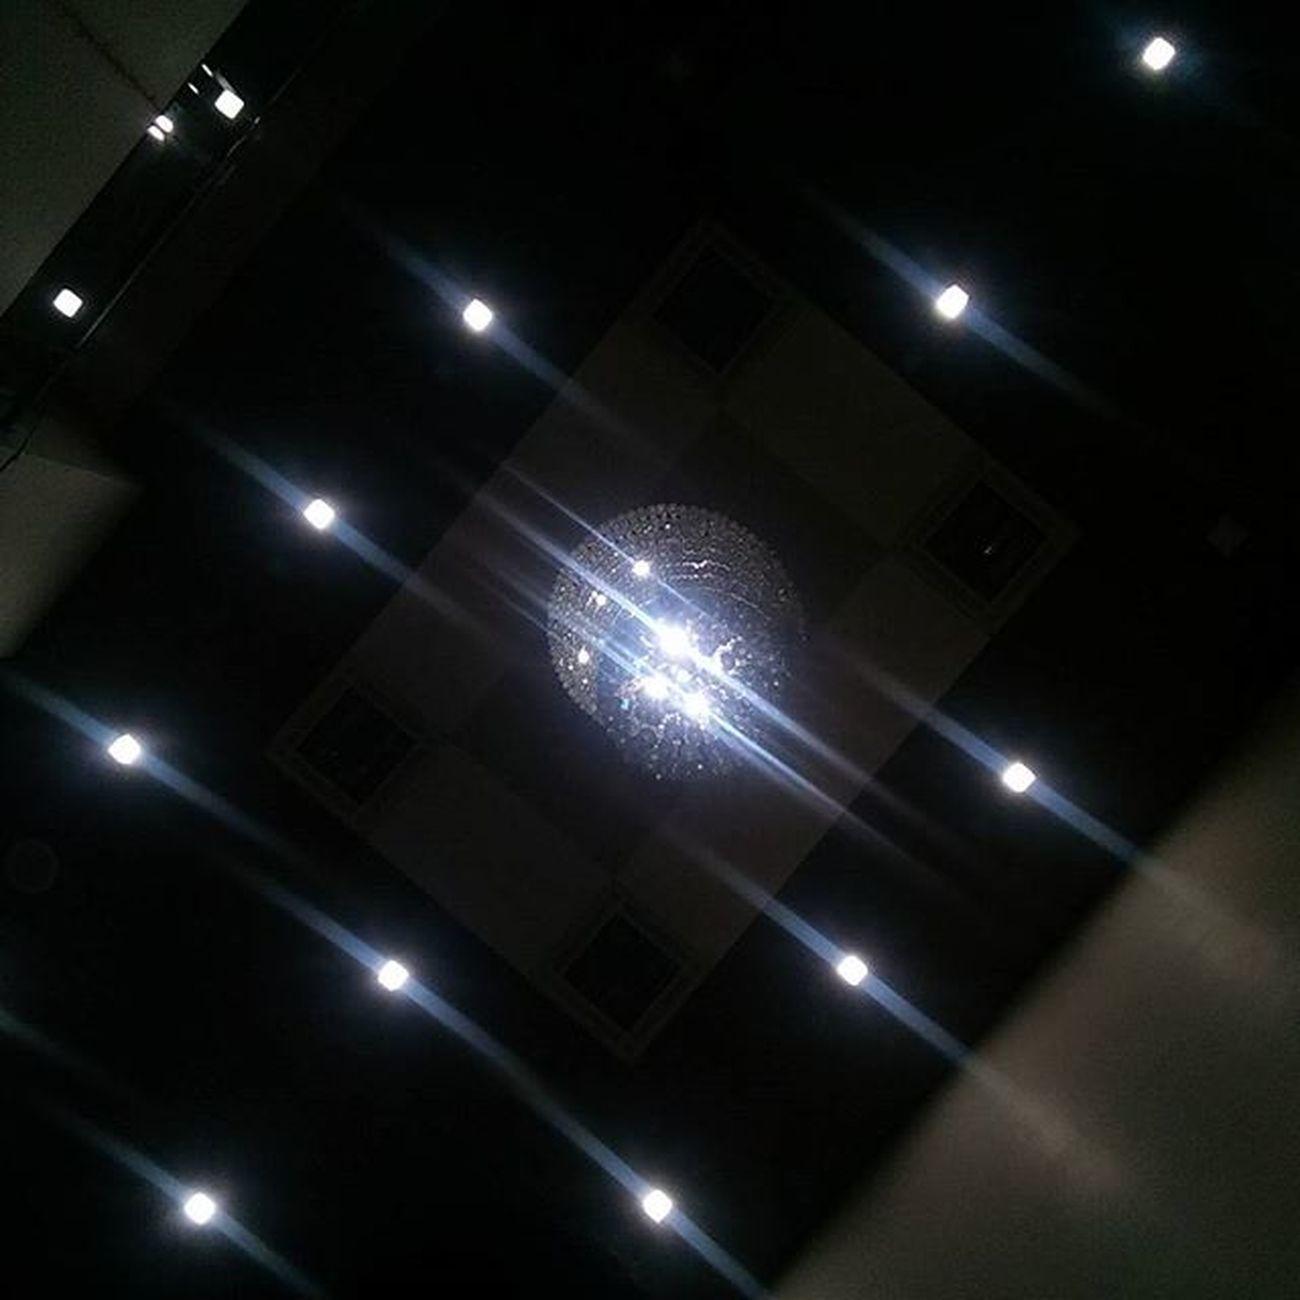 Stars on Oneplusone (unprocessed) 5mp front cam Onepluslife Maharashtra Solapur